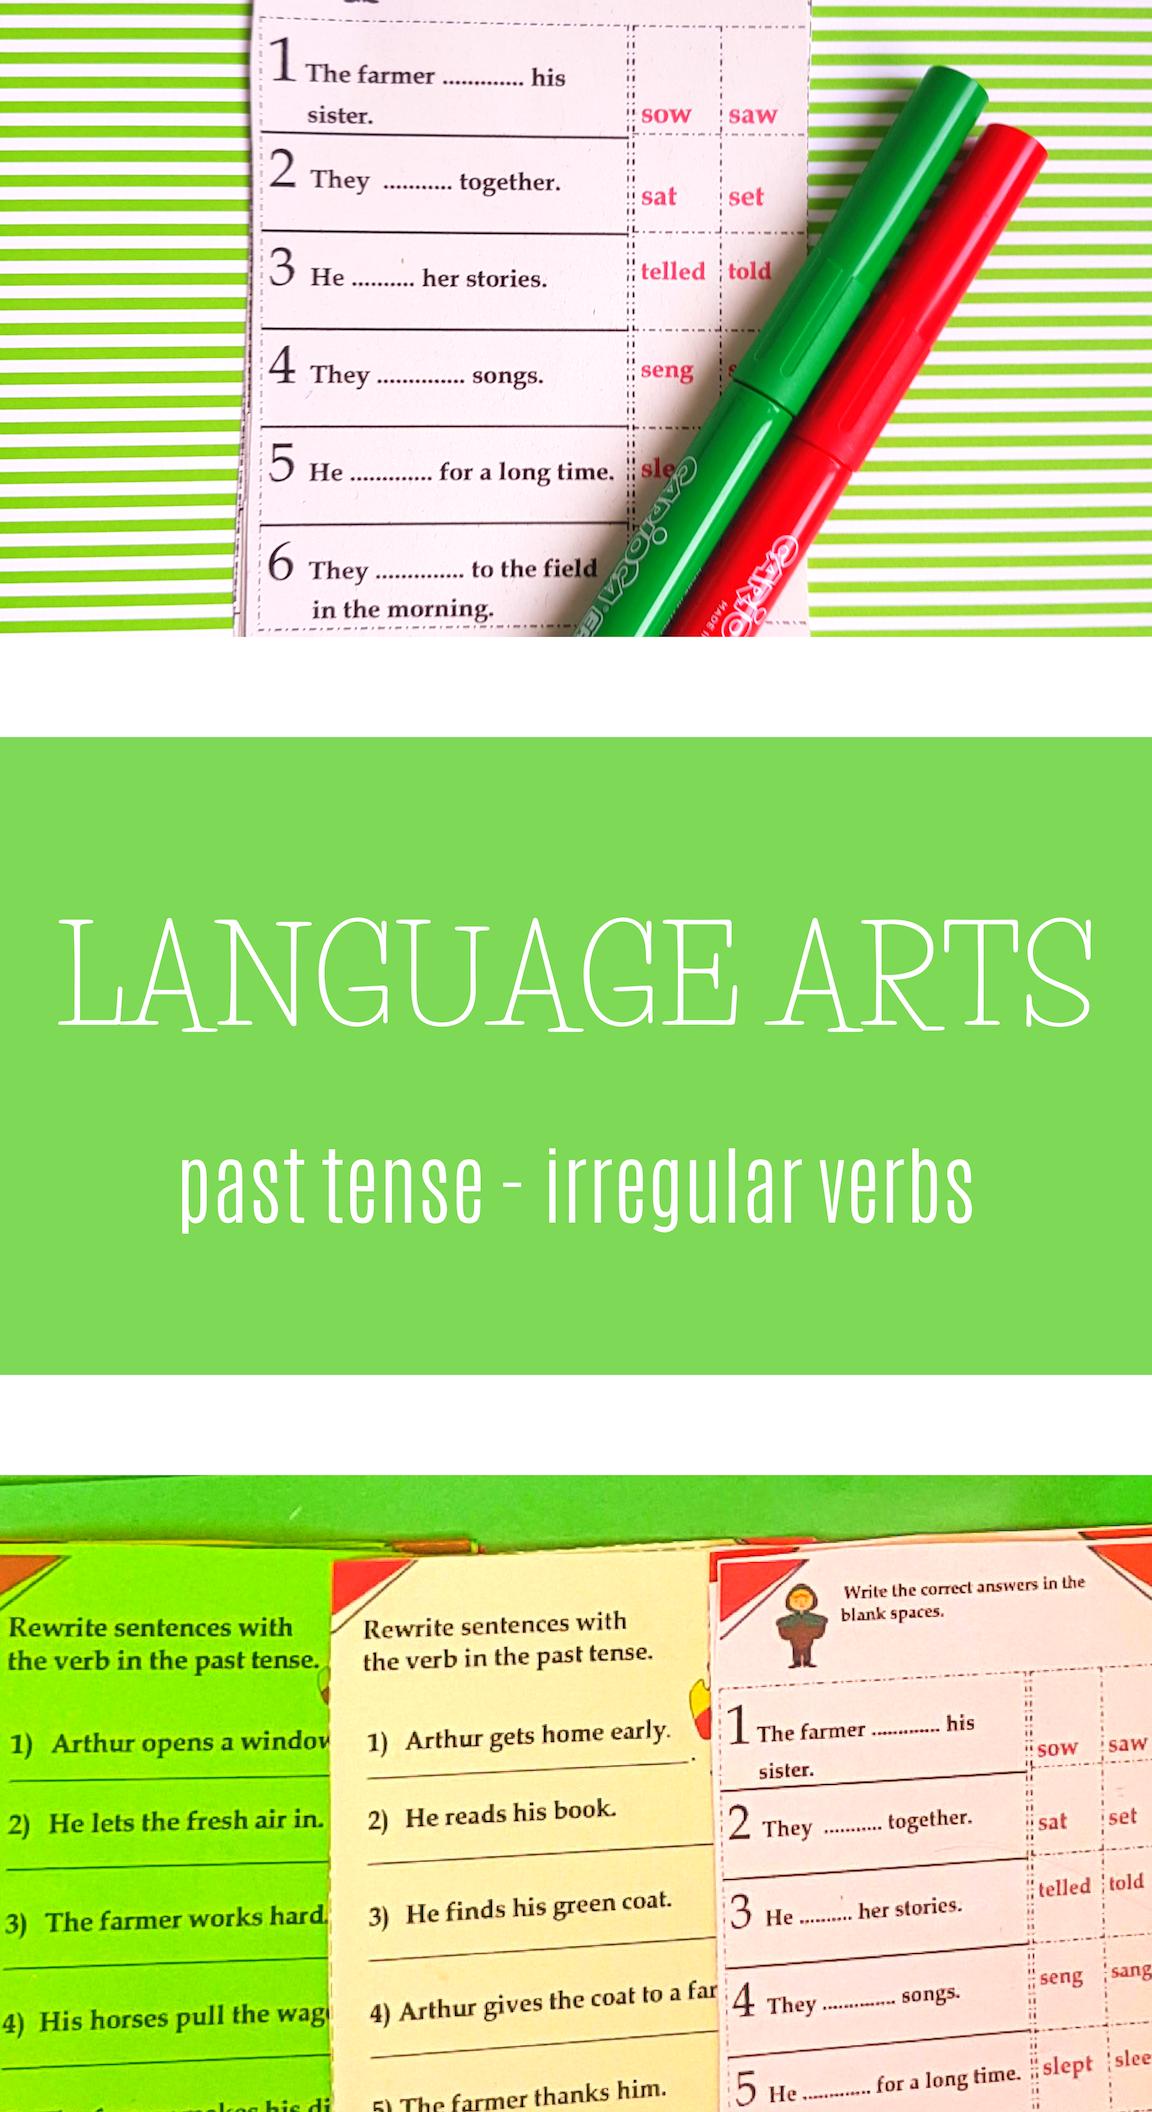 Irregular And Regular Past Tense Verbs Worksheets And Interactive Notebook Irregular Verbs Regular Past Tense Verbs Past Tense [ 2112 x 1152 Pixel ]